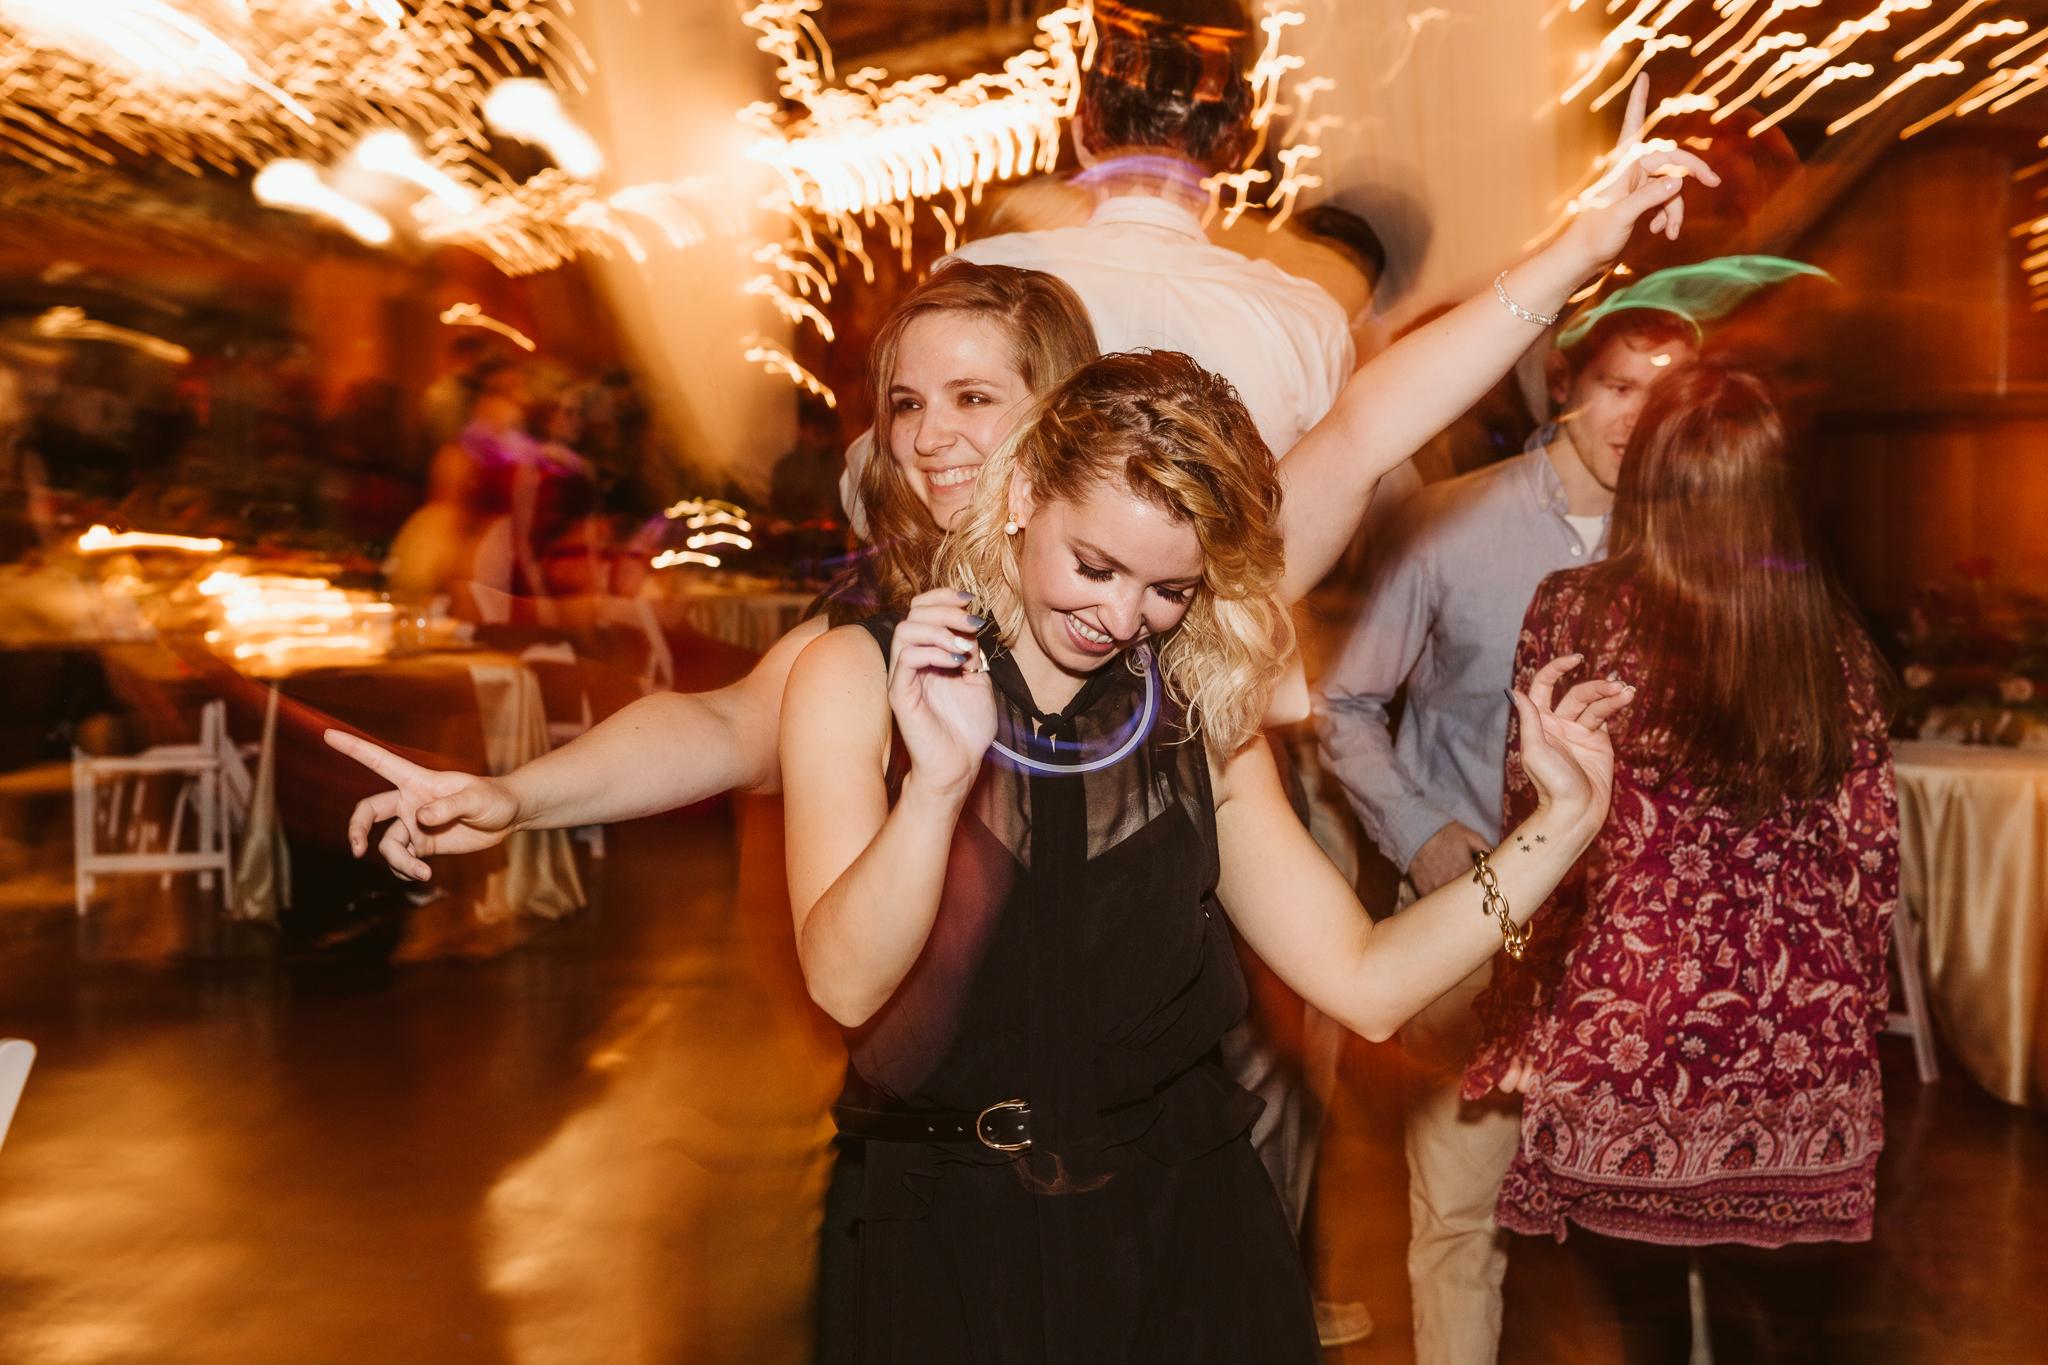 0182 Ariana Jordan Photo - Cameron & Lauren's Wedding at Talon Winery  9891.jpg